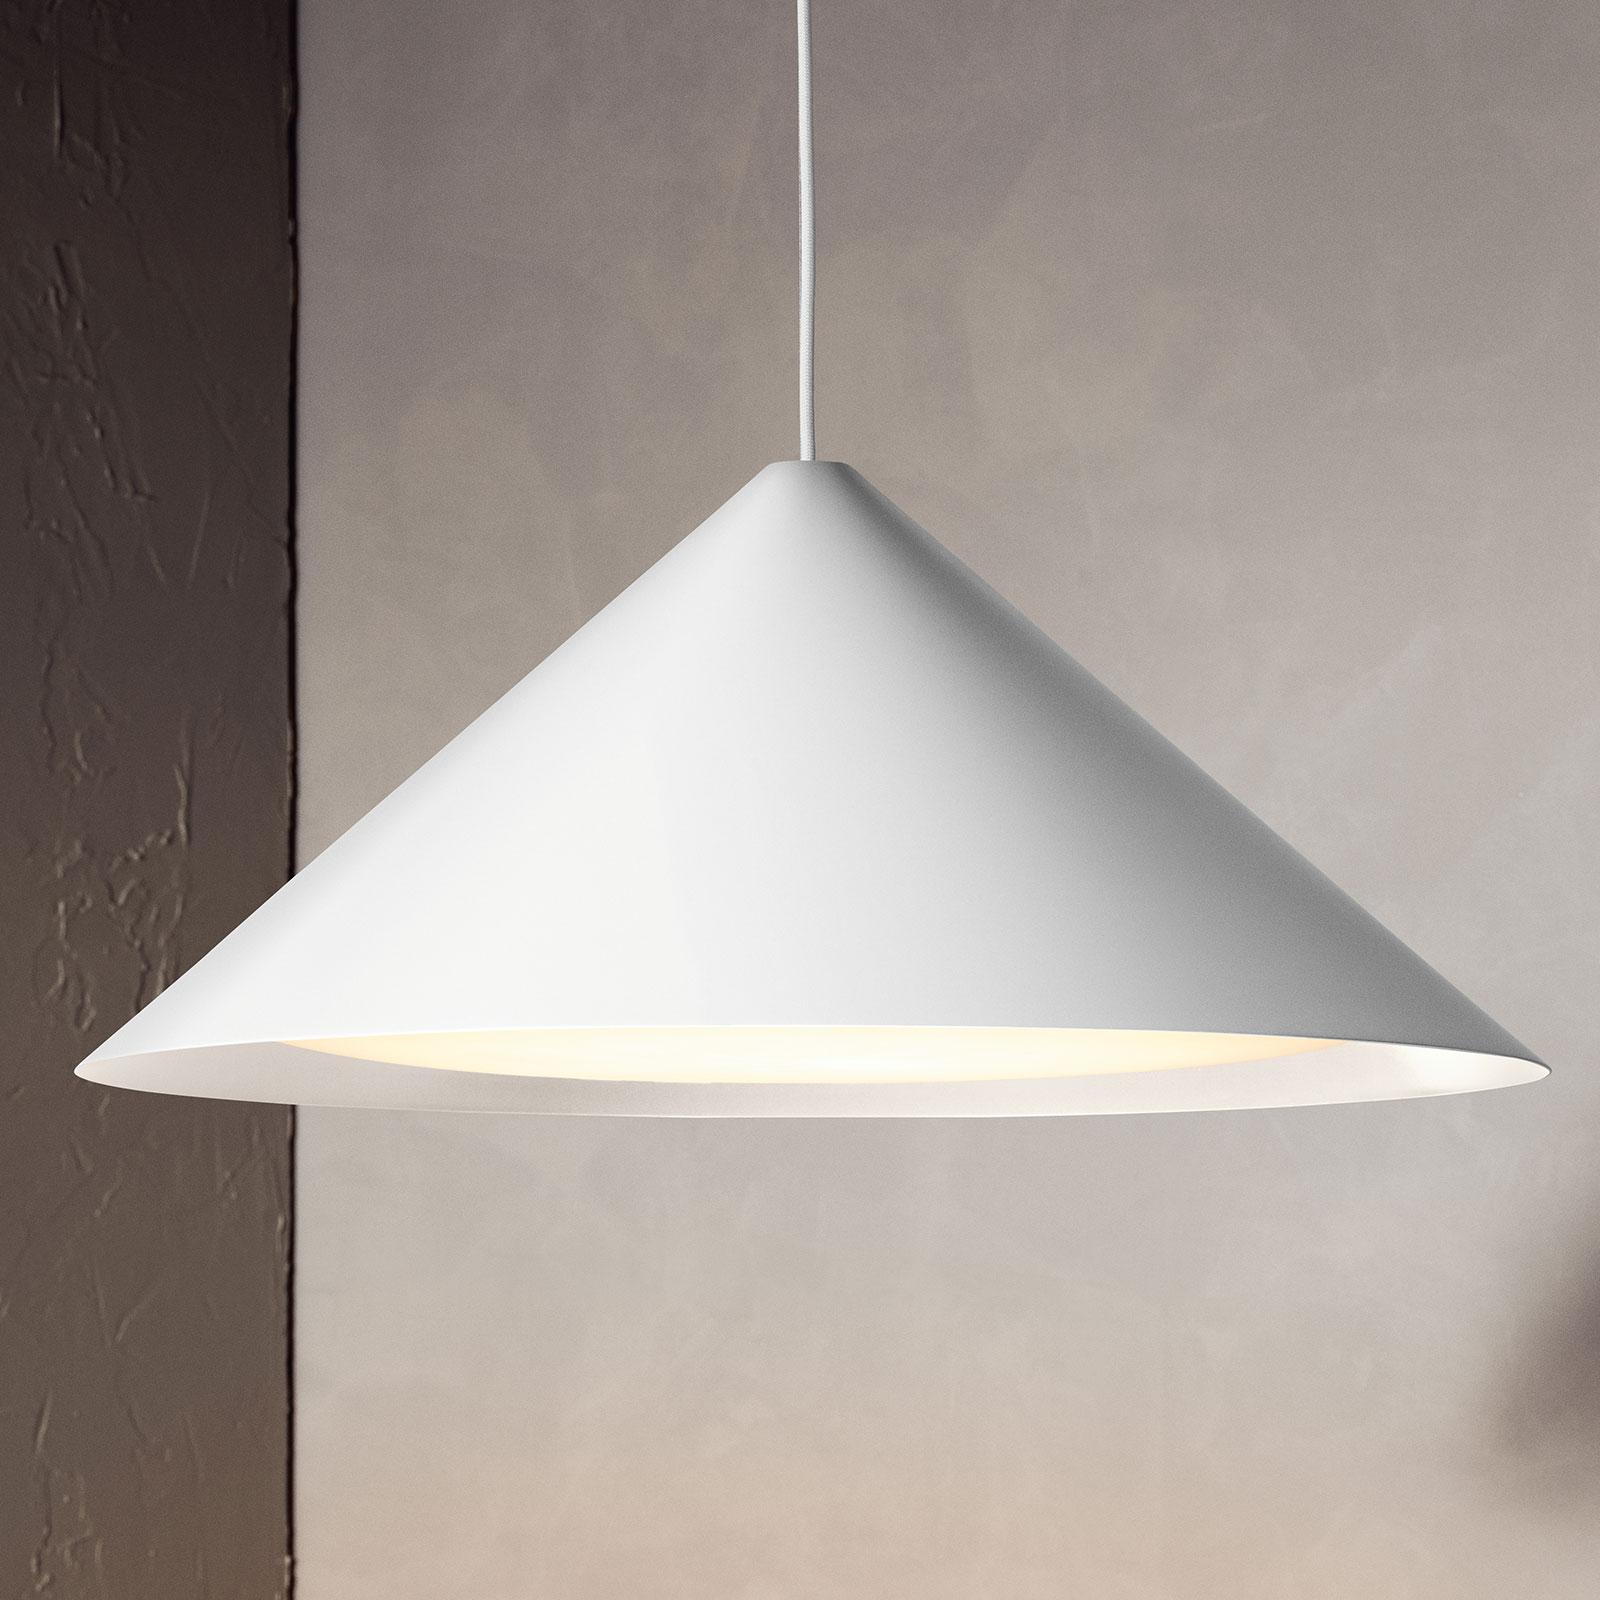 Louis Poulsen Keglen LED hanglamp 65cm wit